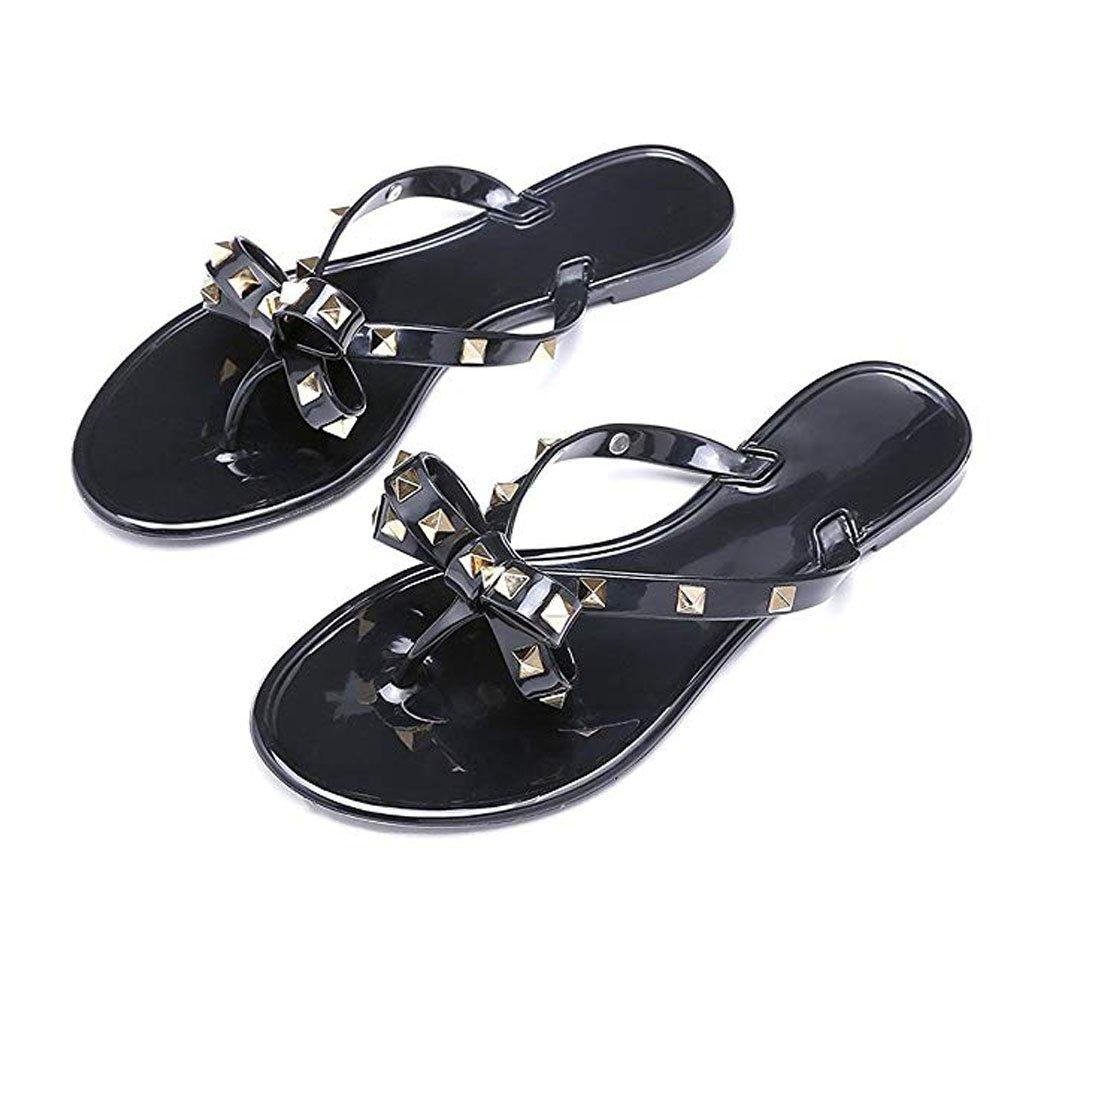 492be78bc Details about Utop Women s Rivets Bowtie Flip Flops Jelly Thong Sandal  Summer Beach Rain Shoes